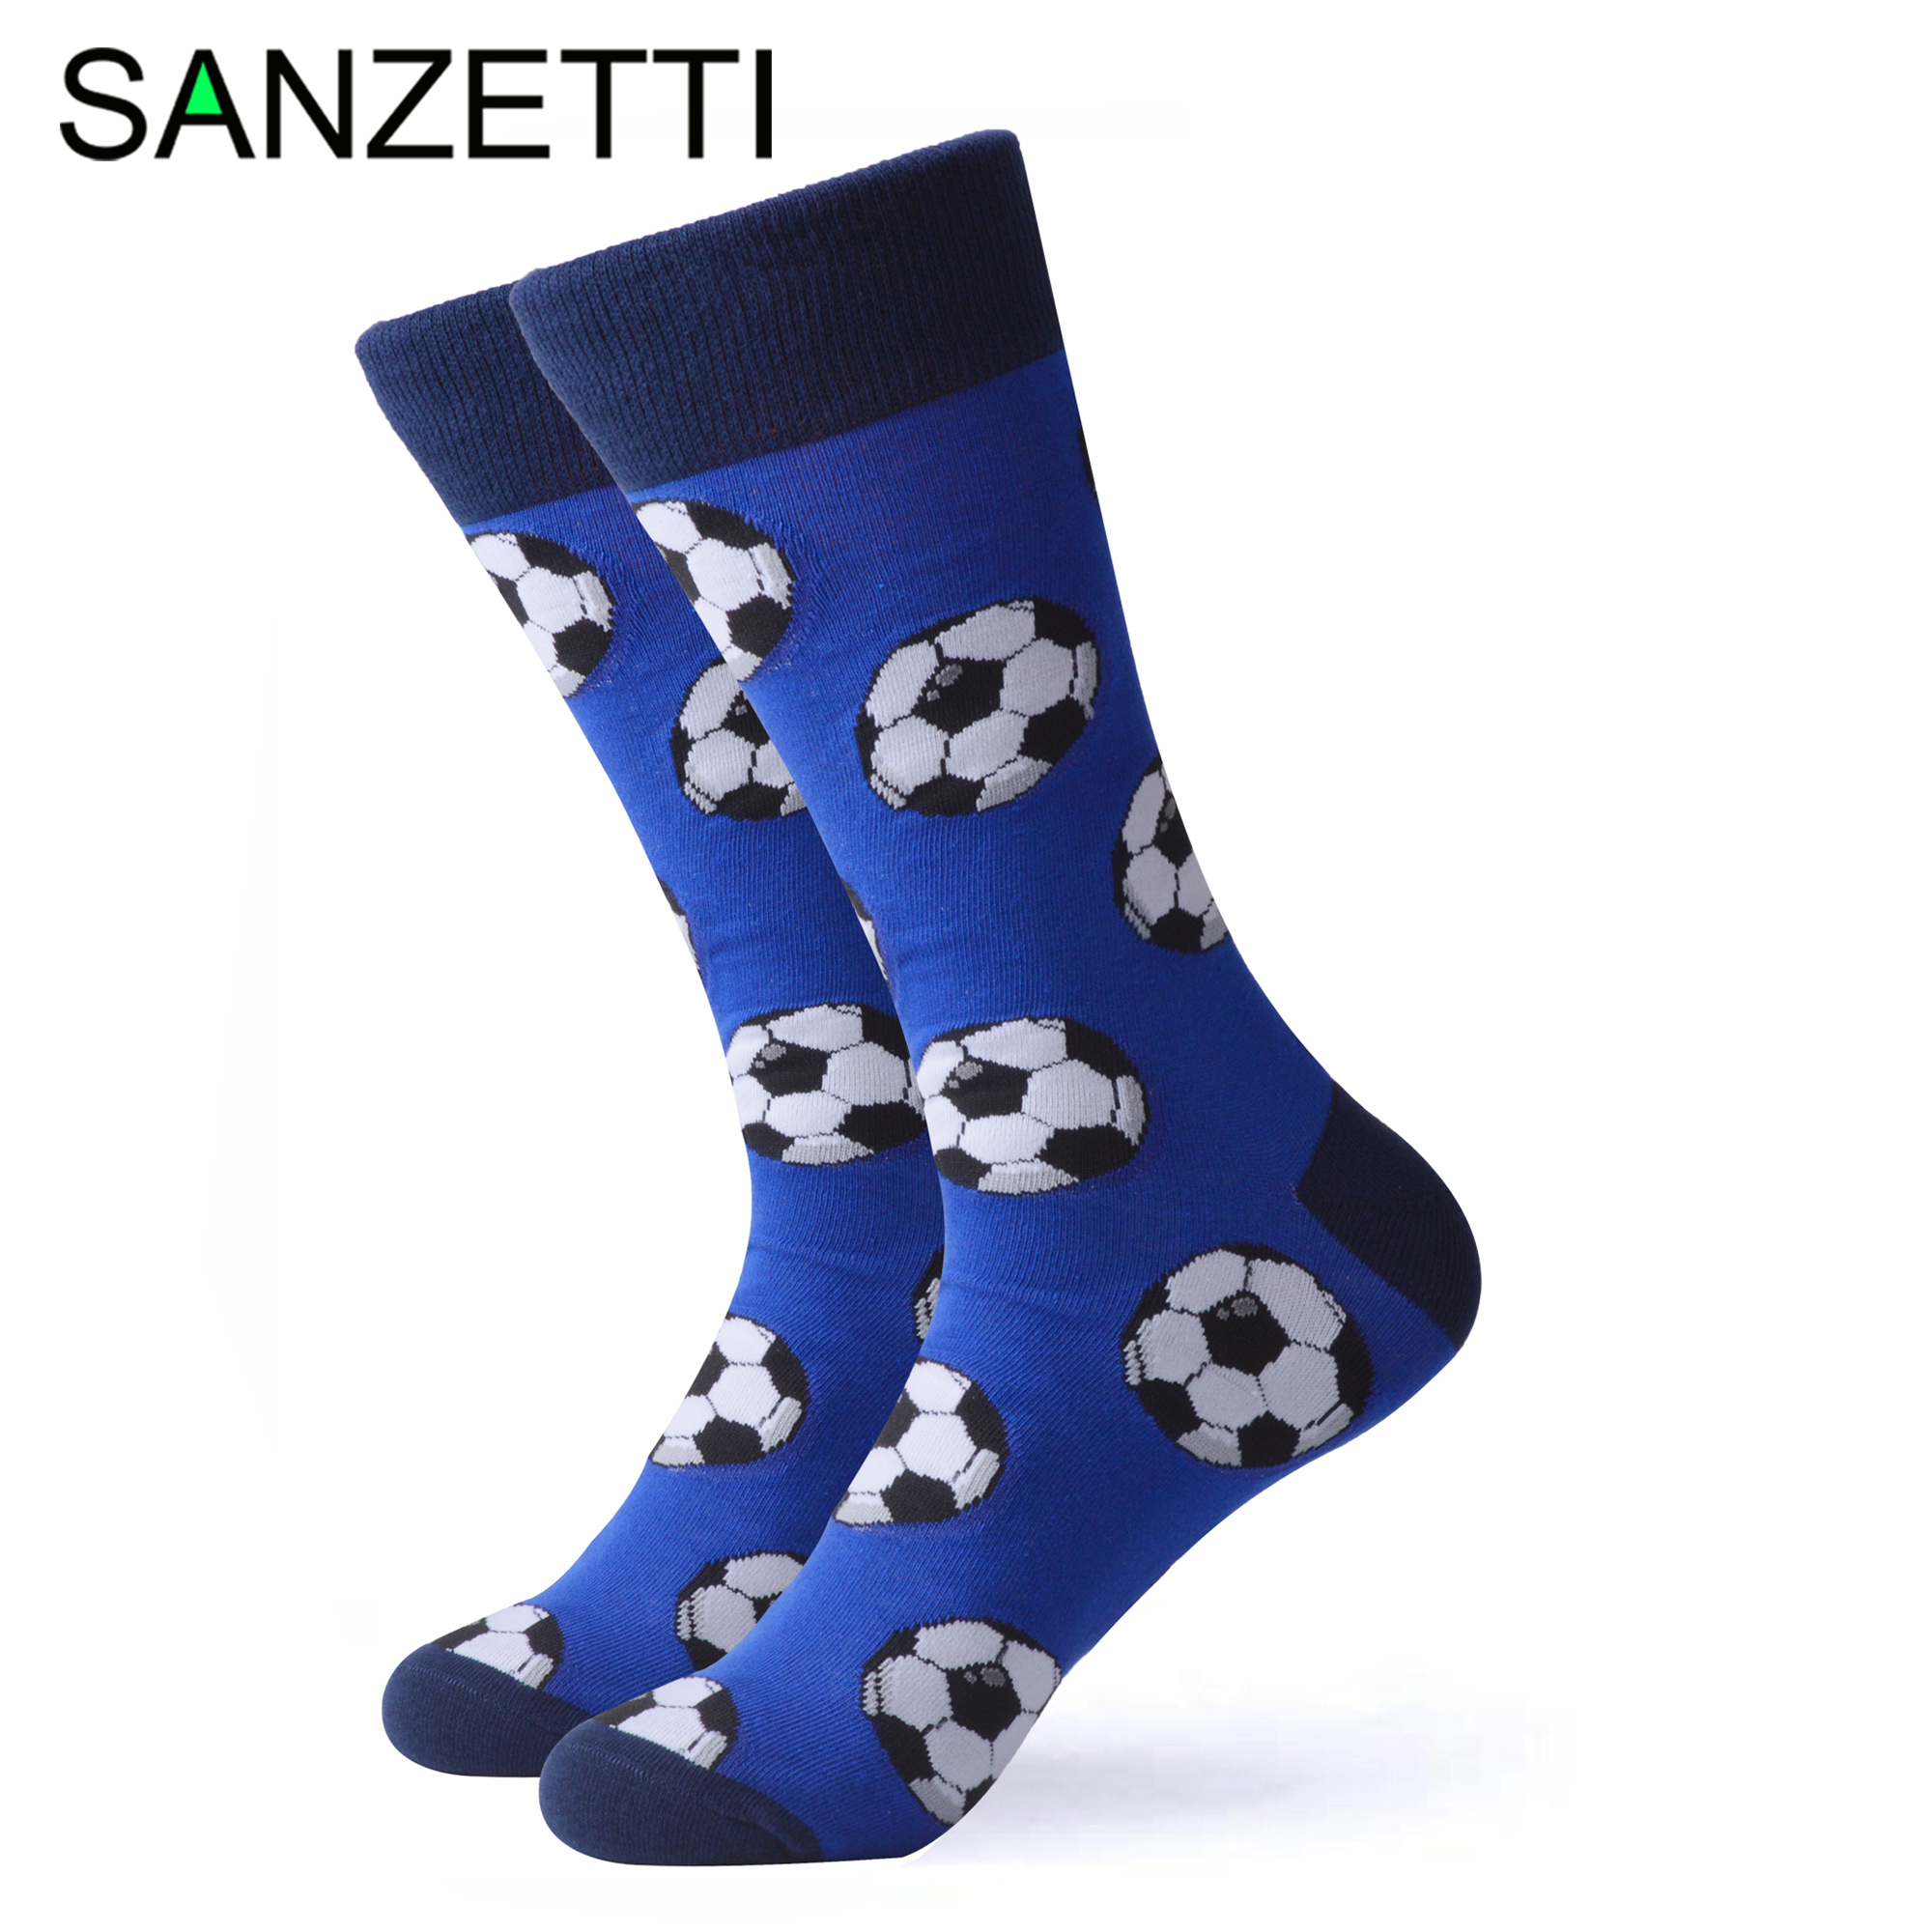 SANZETTI 1 Pair Happy Socks High Quality Men's Colorful Comfortable Combed Cotton Football Golf Novelty Gift Wedding Dress Socks